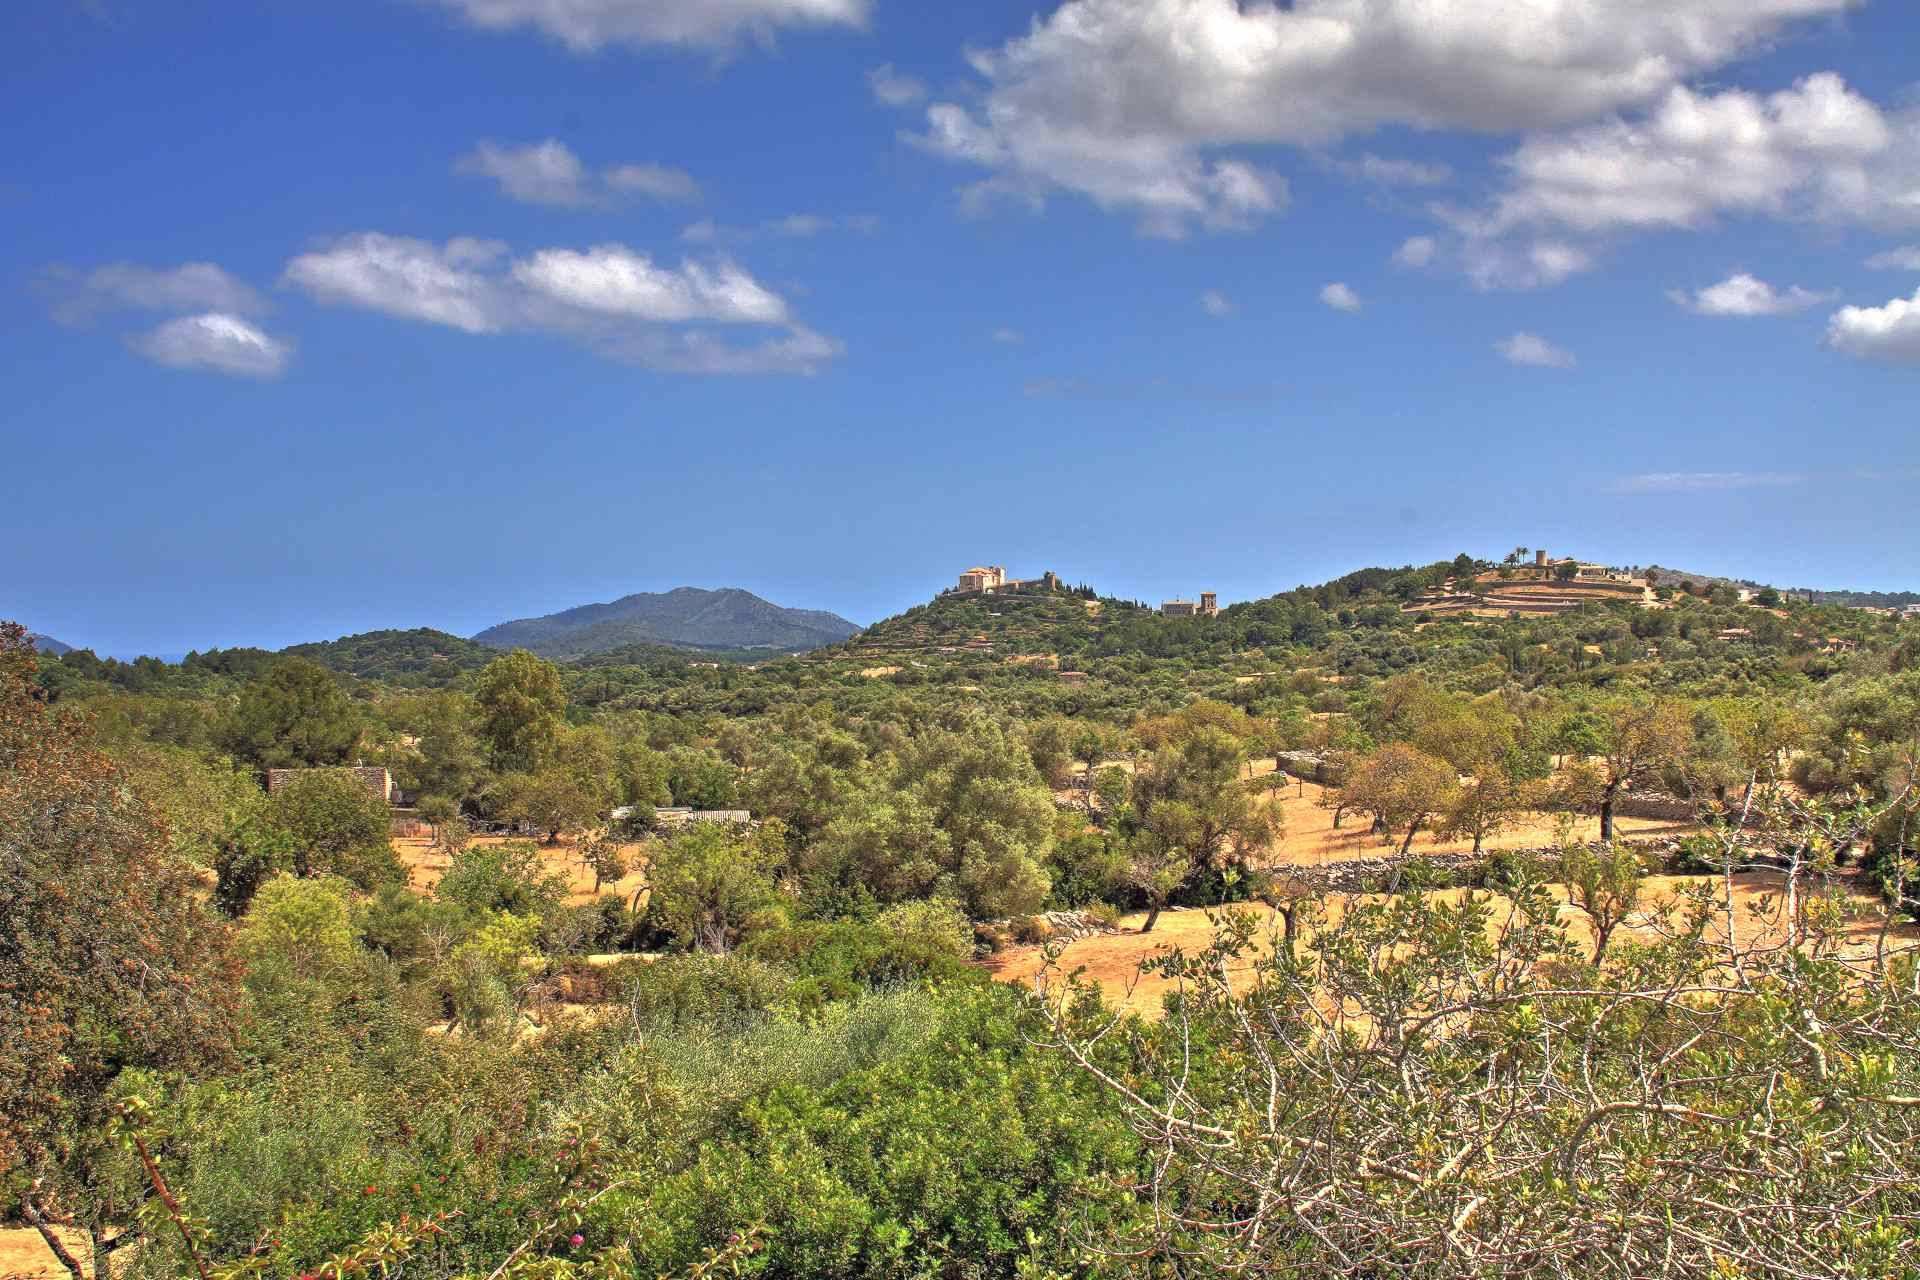 01-51 Authentische Finca Mallorca Nordosten Bild 27